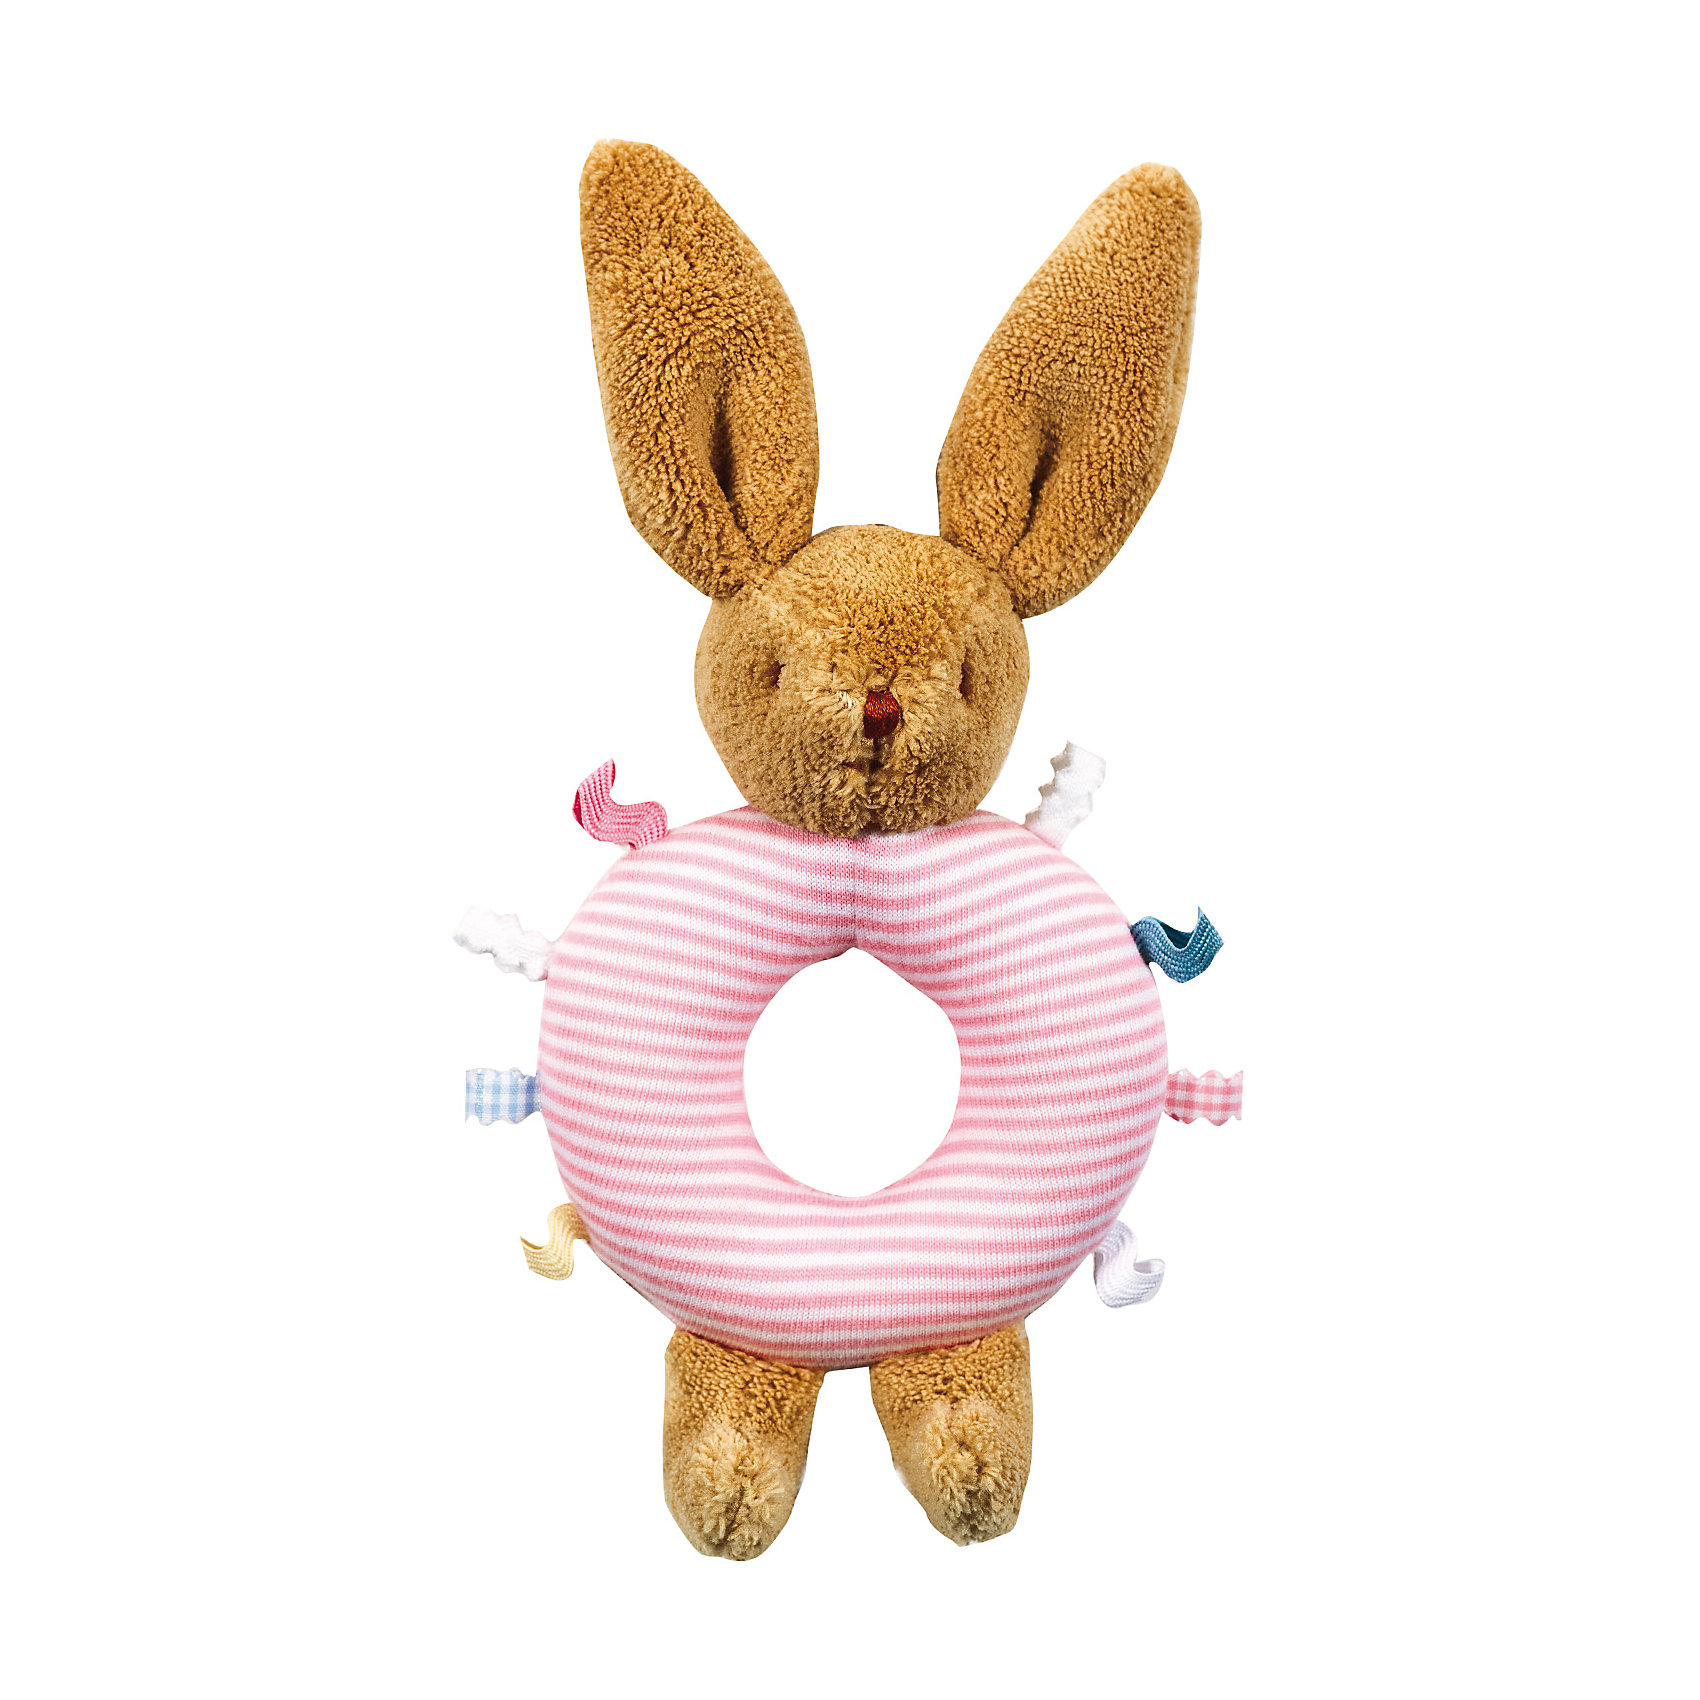 TROUSSELIER Погремушка-кольцо Зайчик, розовое, 16см, Trousselier trousselier светильник ночник балерина trousselier белый